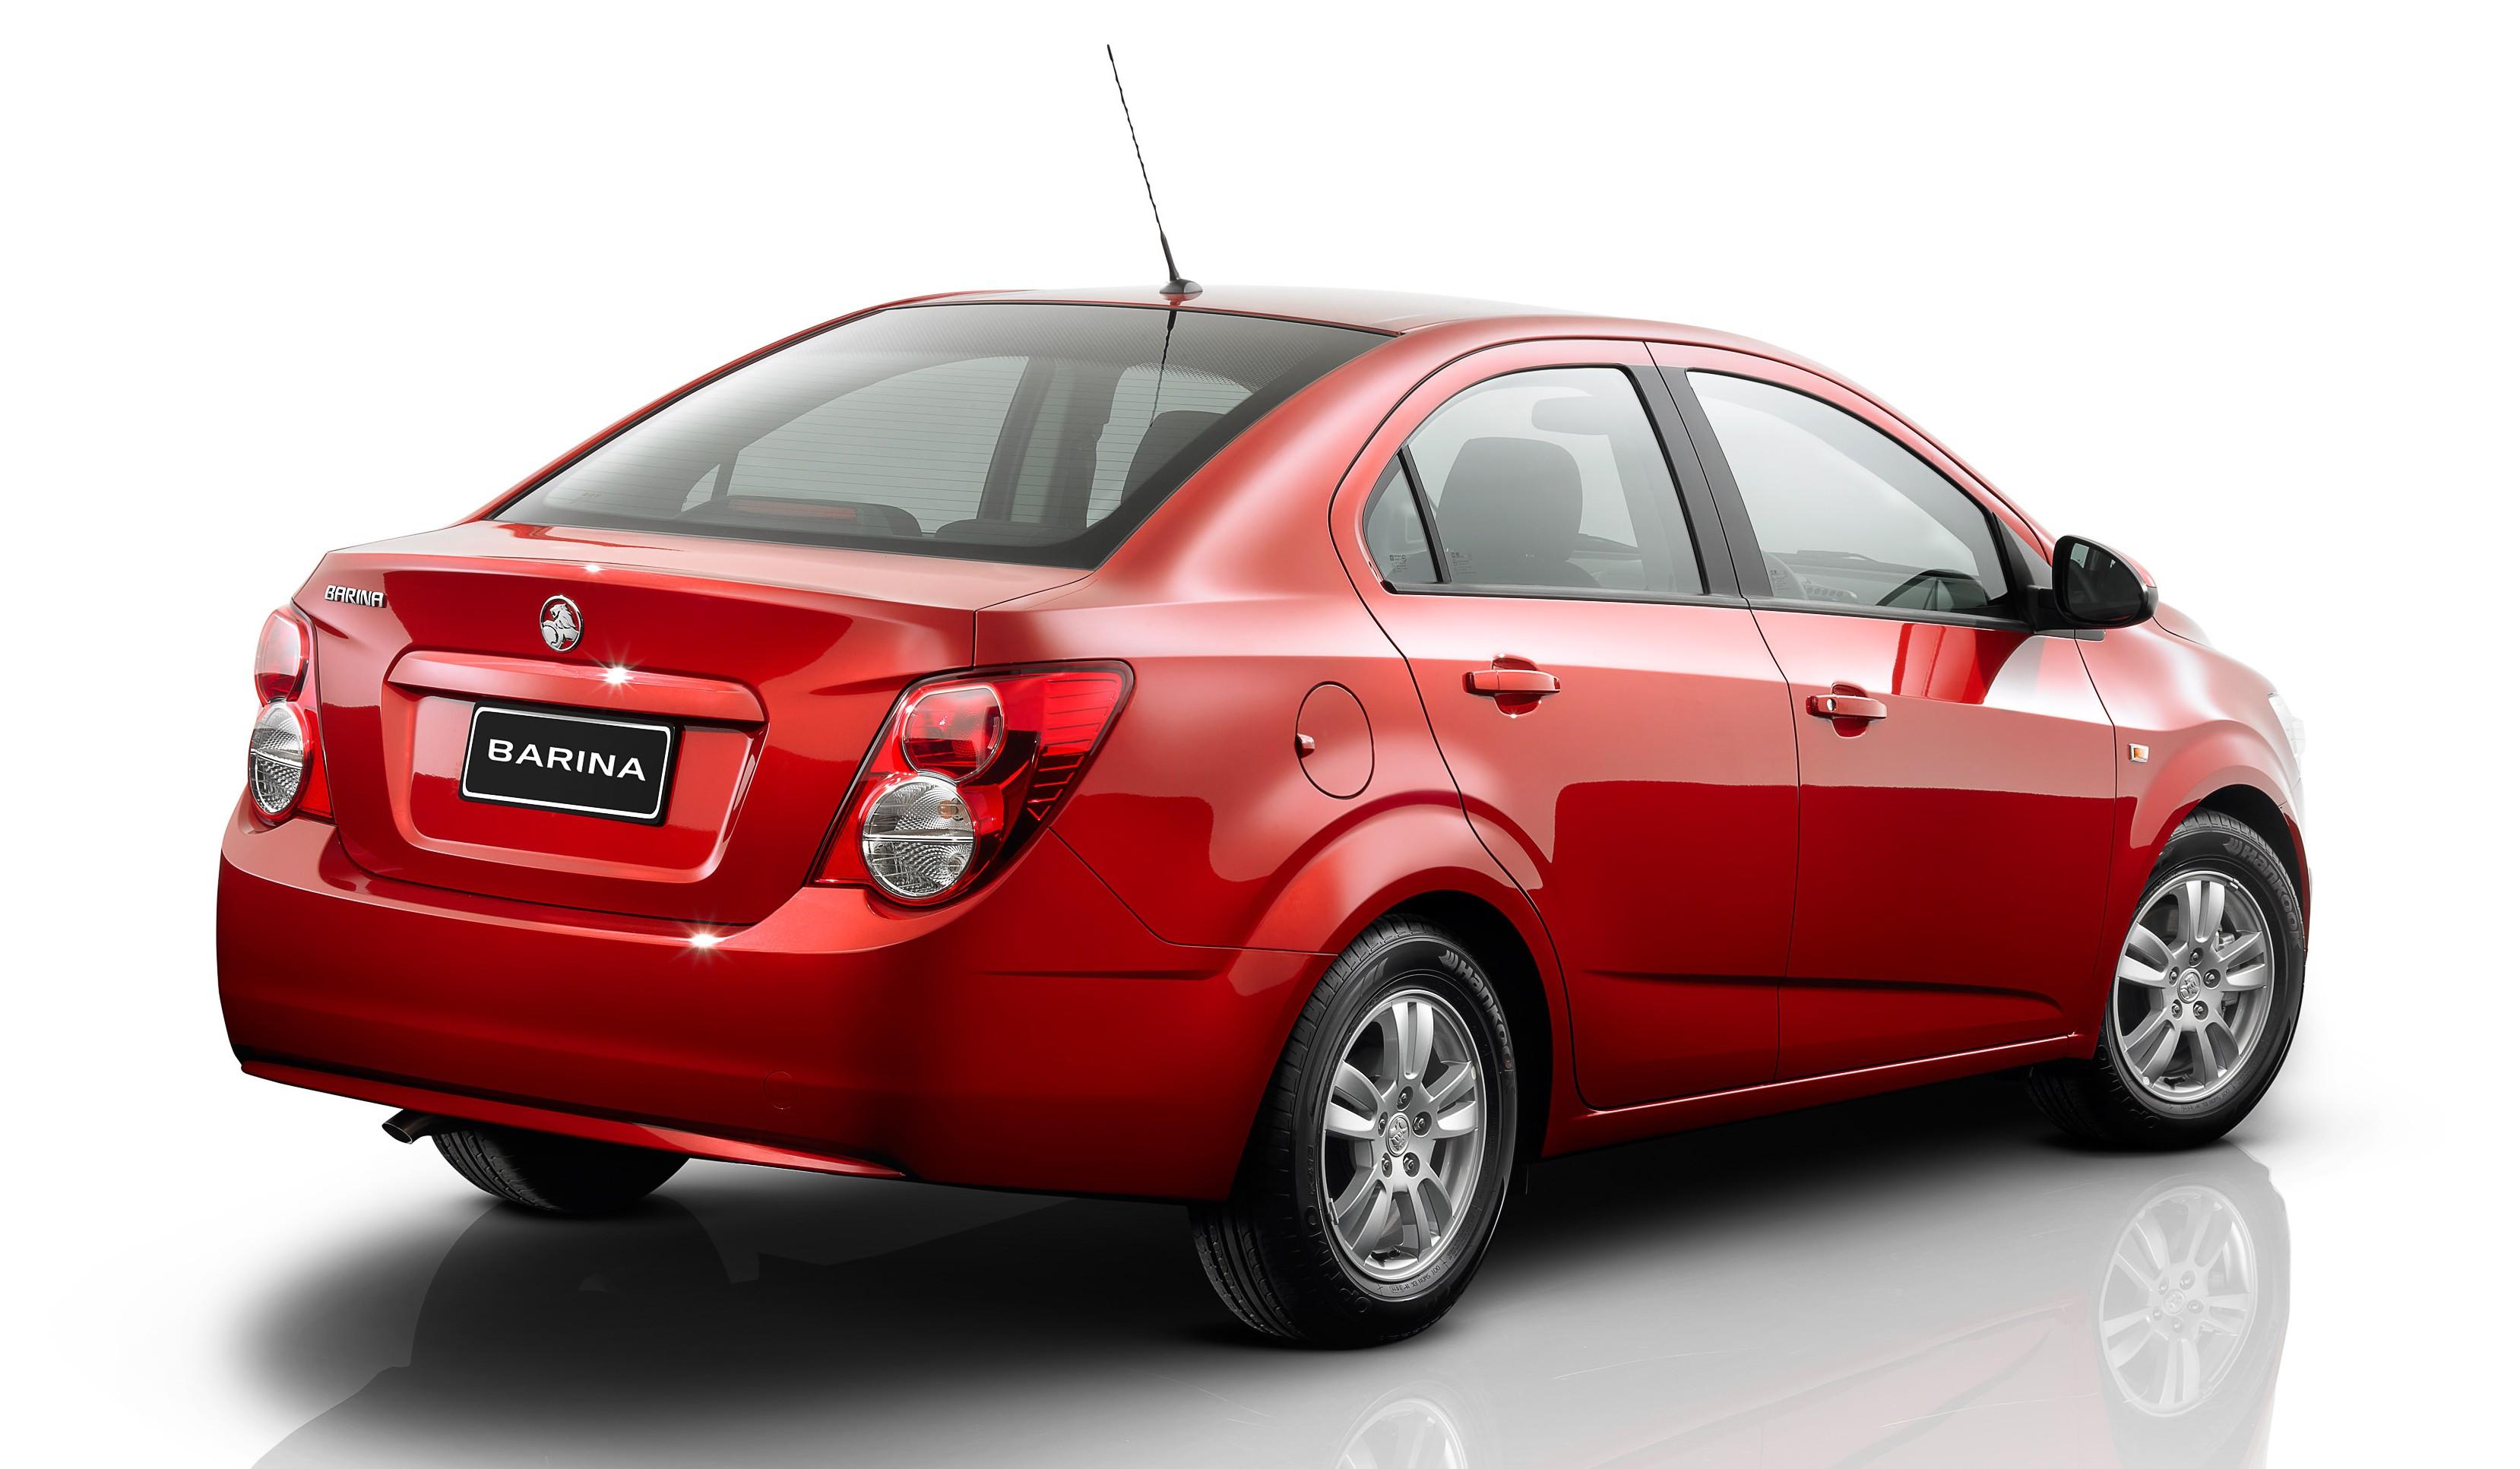 holden new car releaseHolden Barina sedan released  Photos 1 of 3